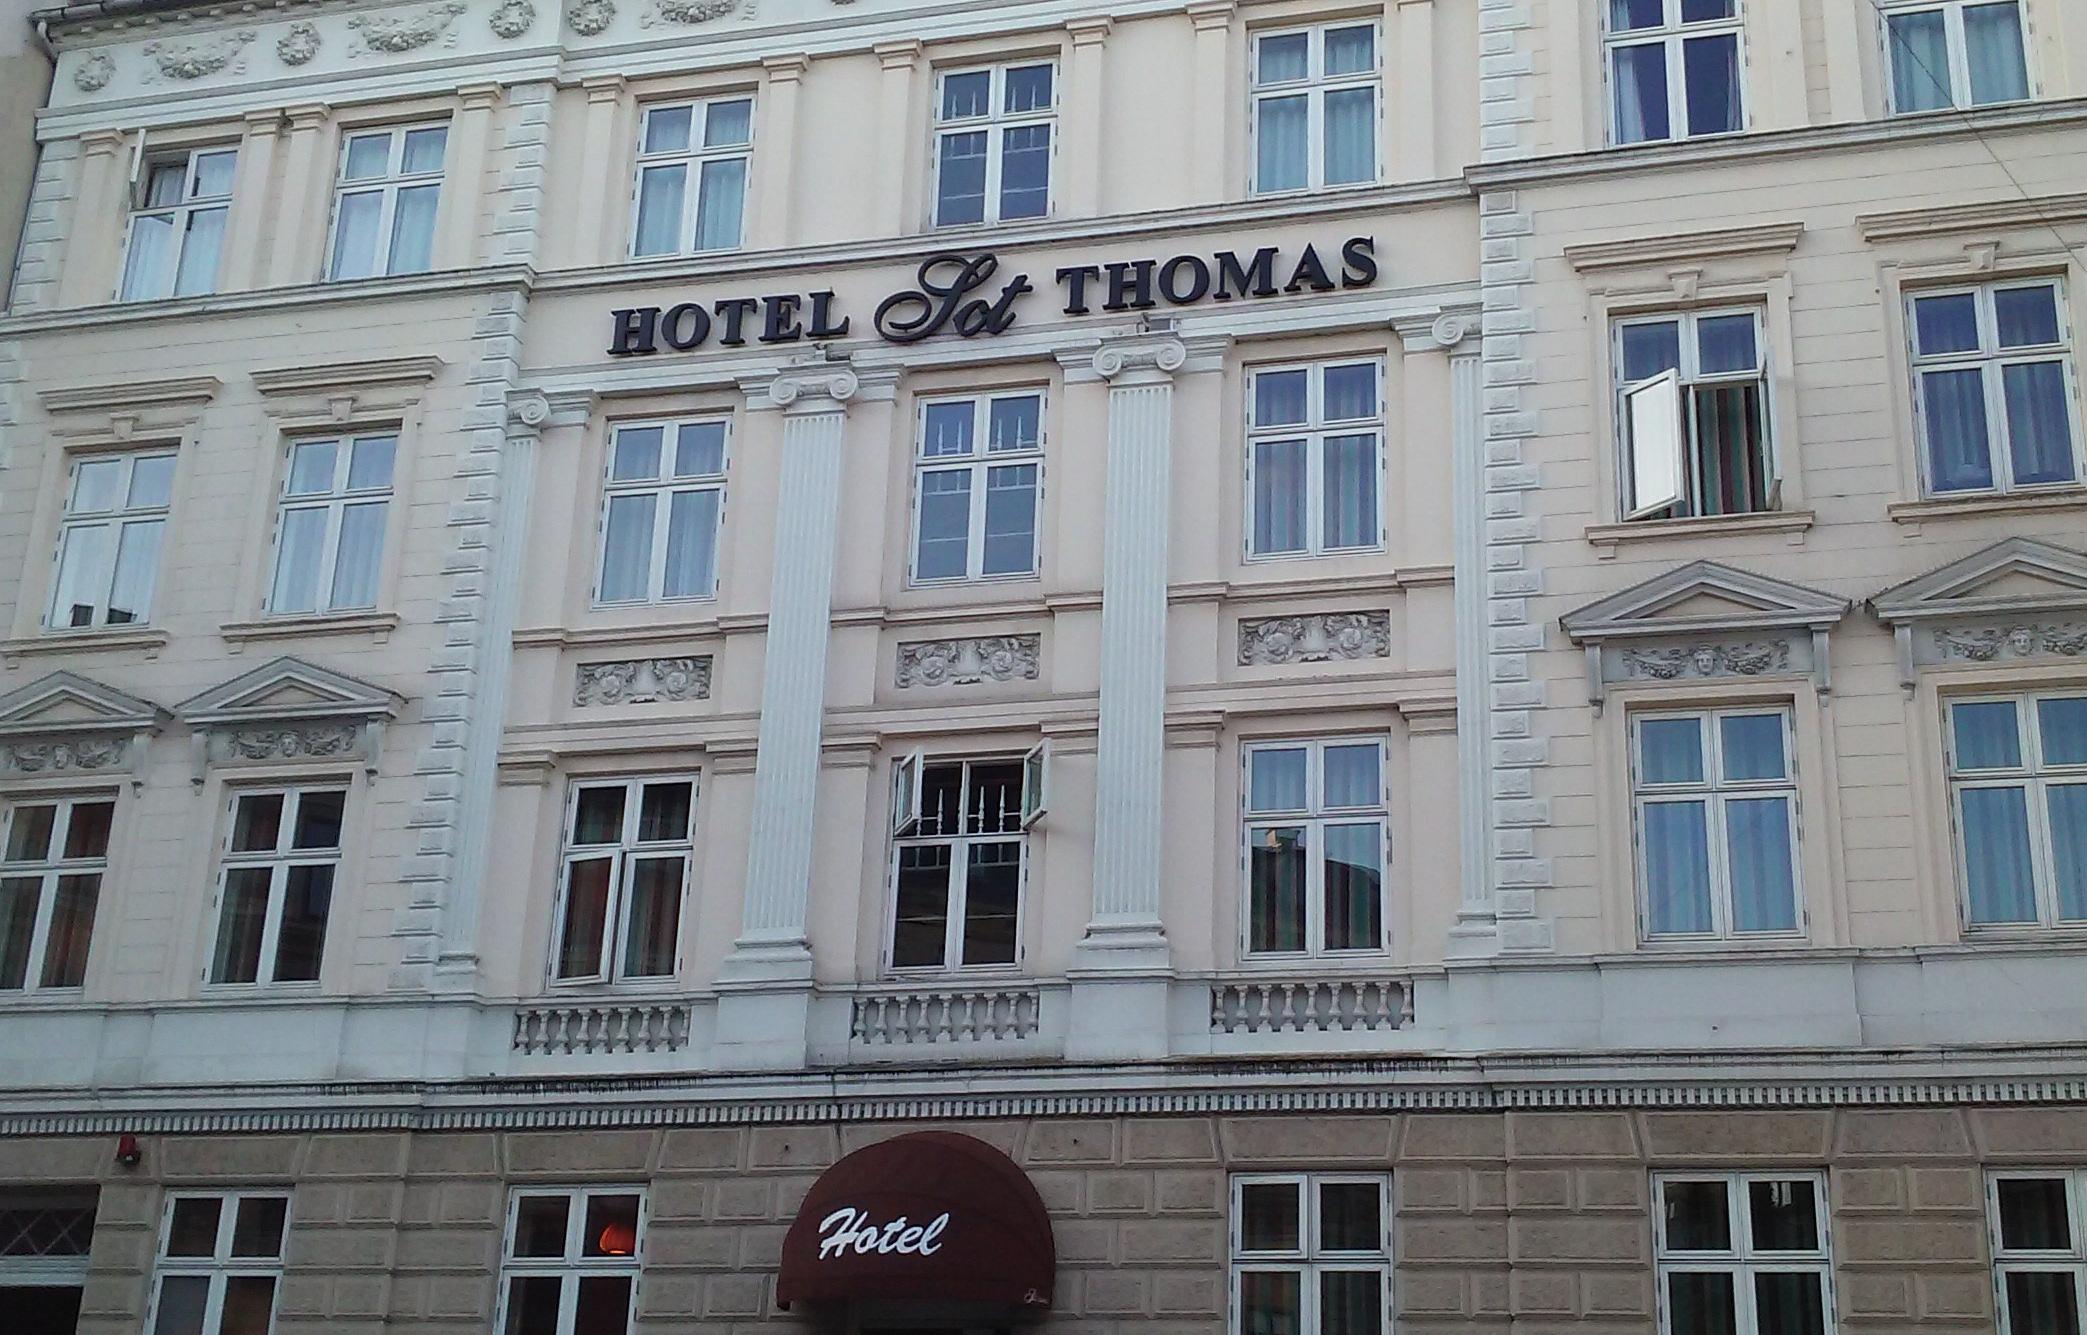 Stay Hotel Kopenhagen : Places we stay hotel sct thomas copenhagen u touring with kids